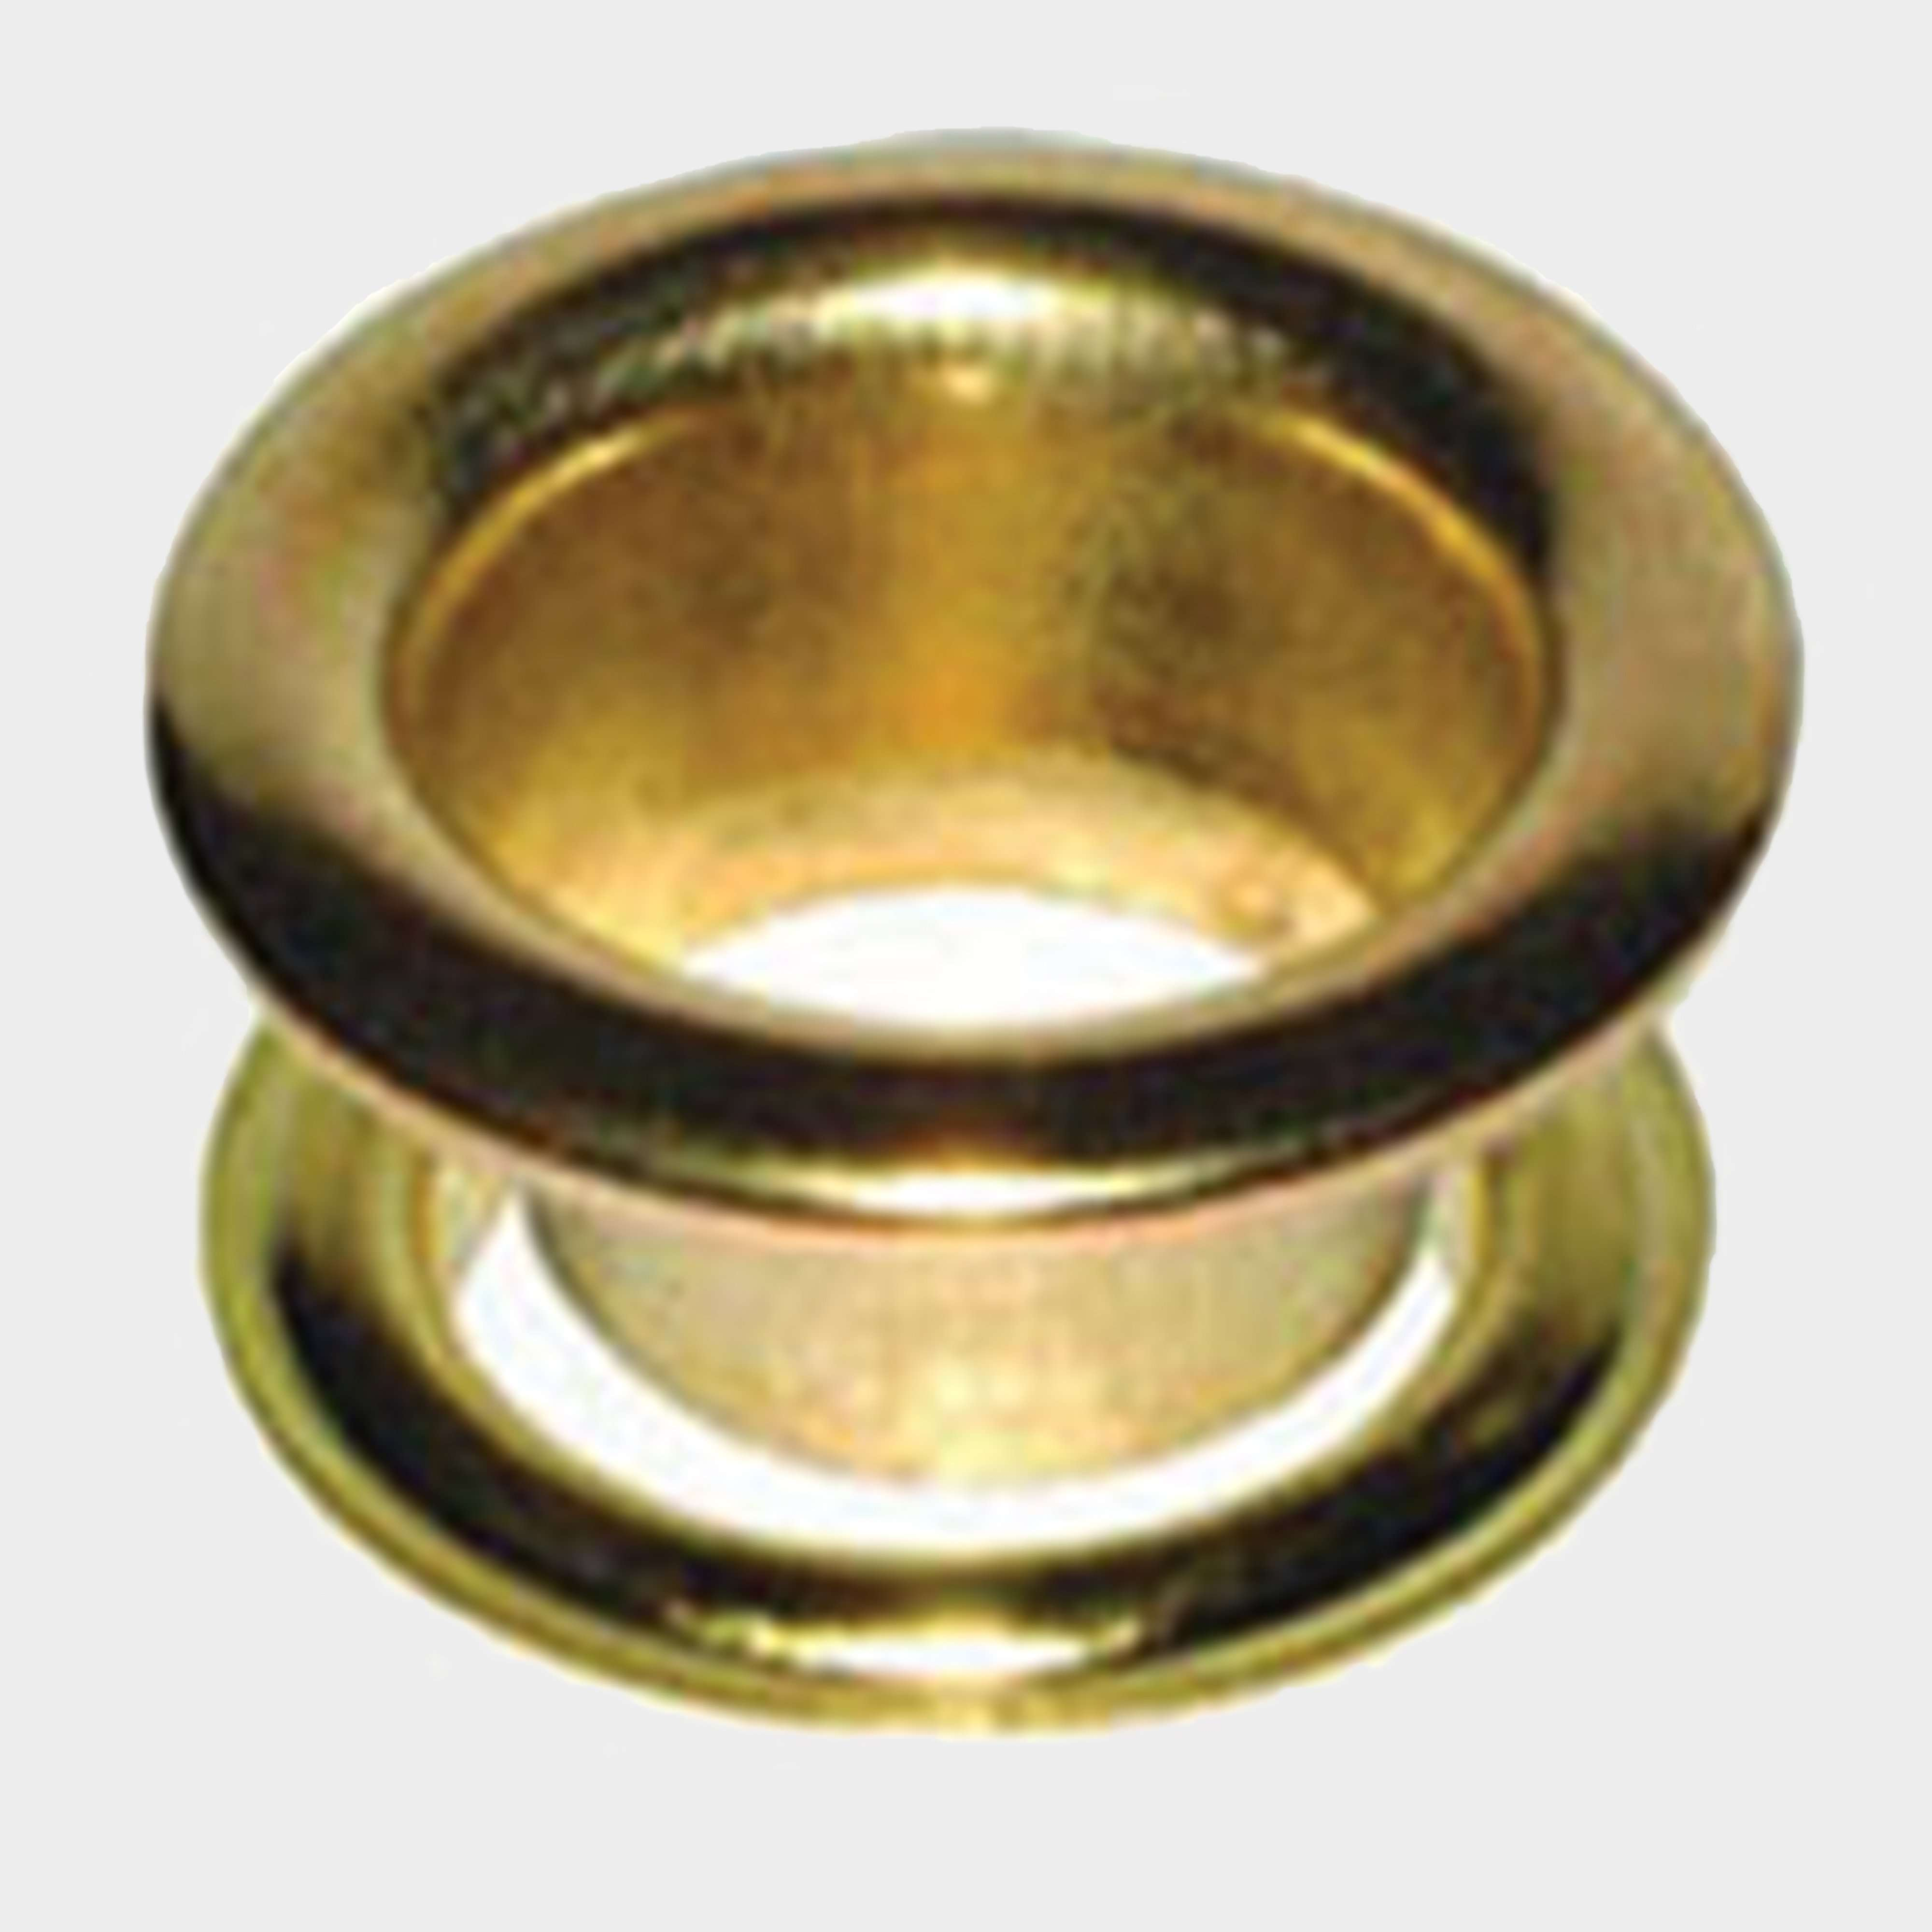 W4 Brass Eyelets 10 Pack